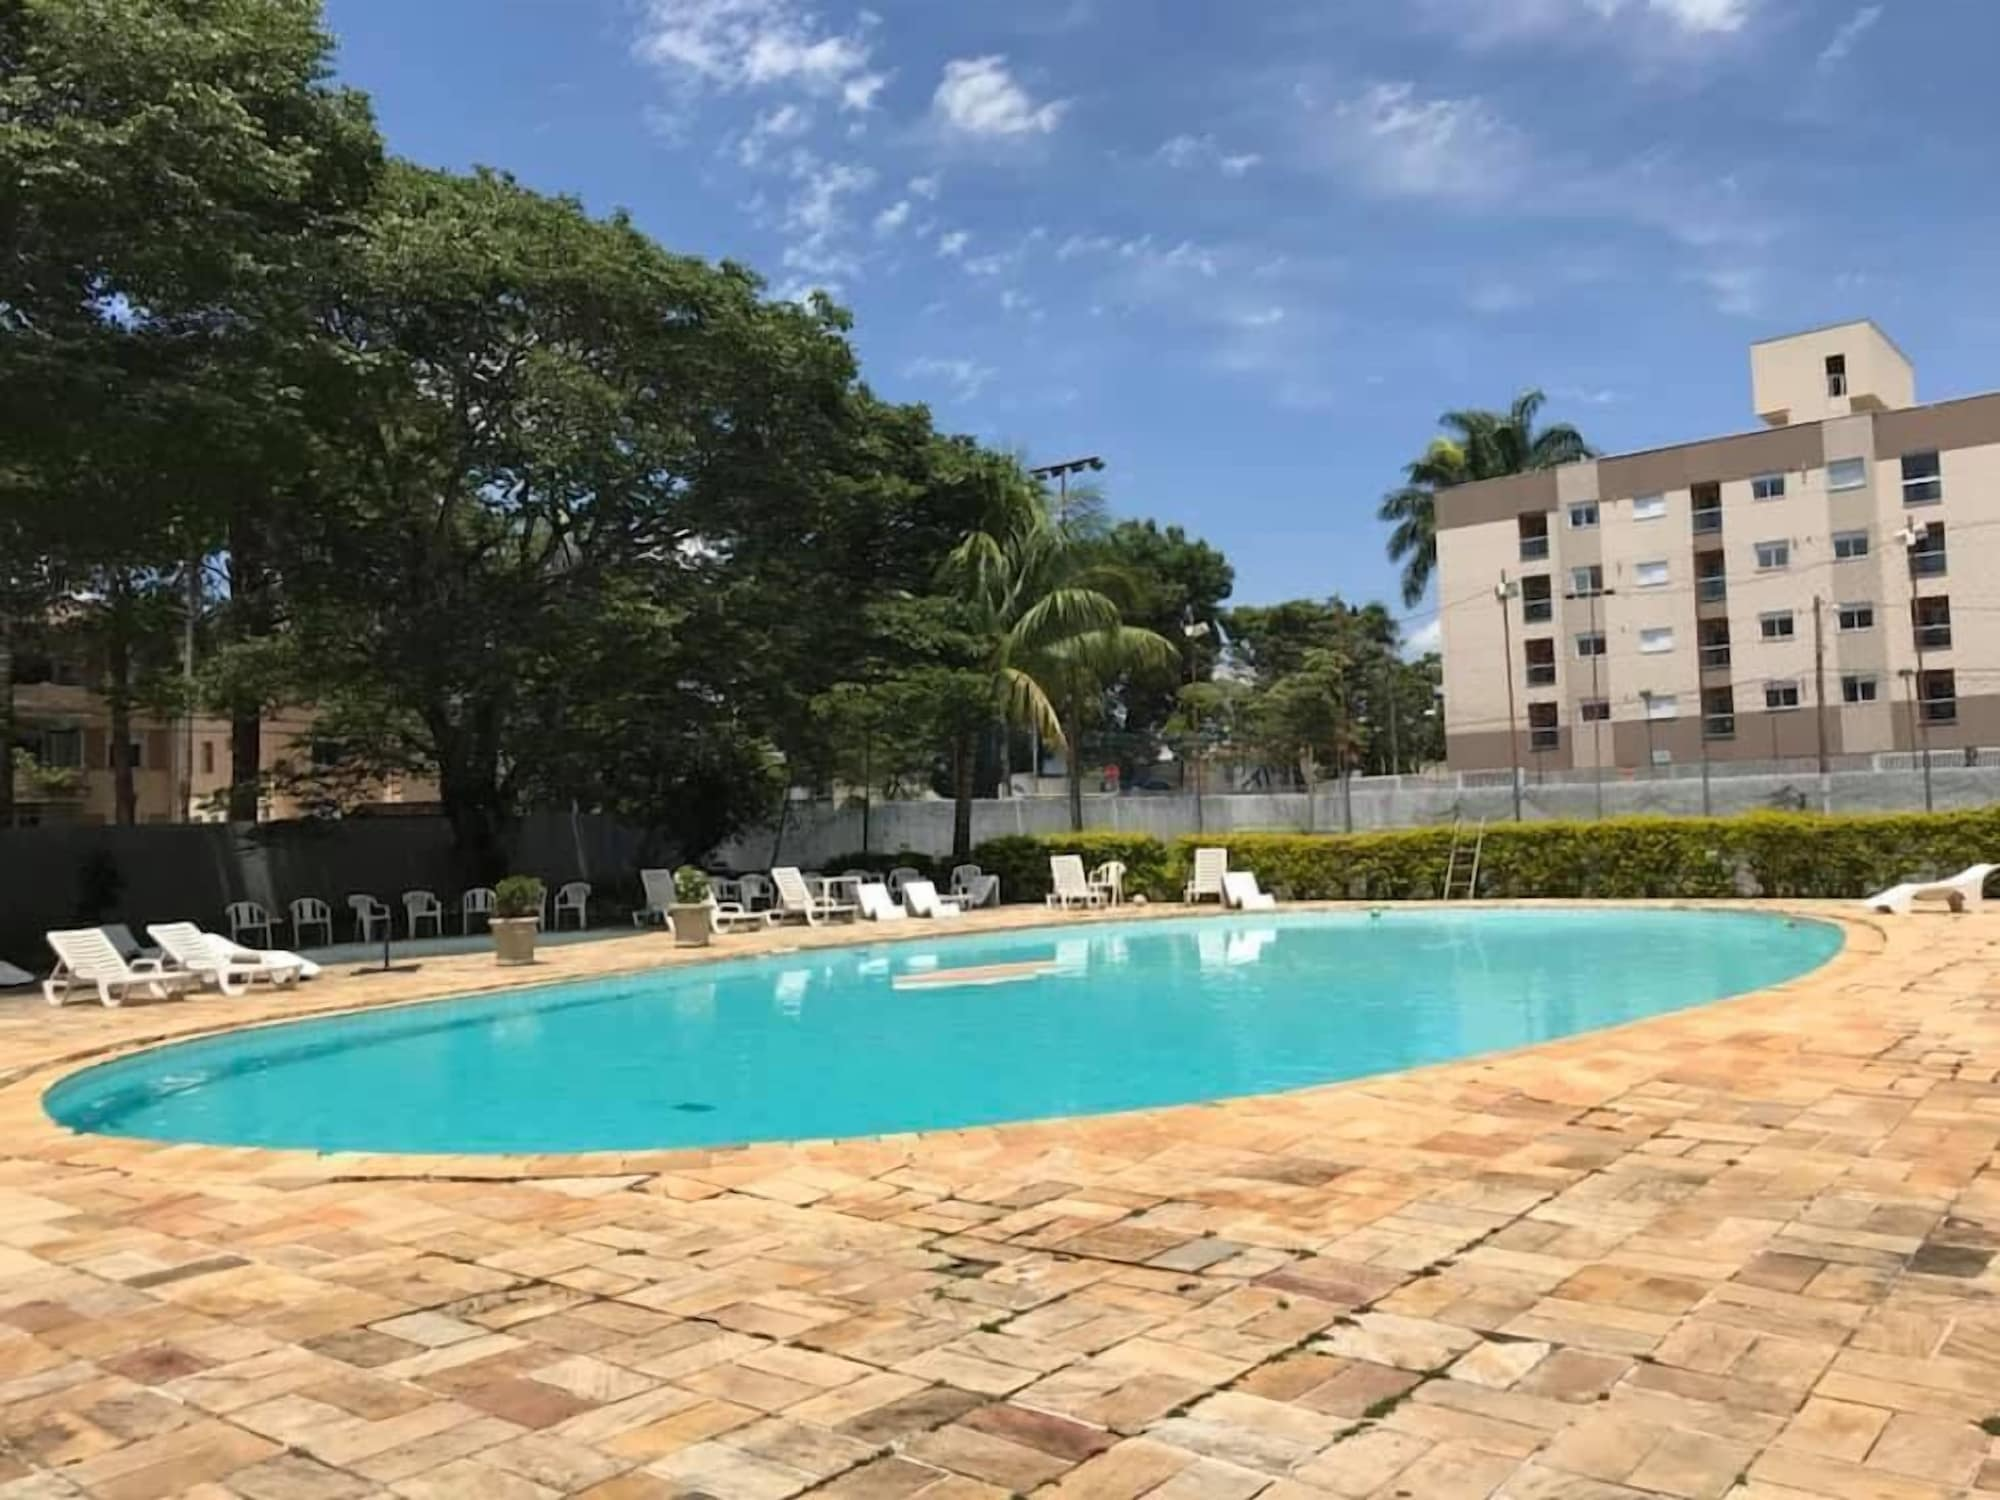 Atibaia Plaza Hotel, Atibaia